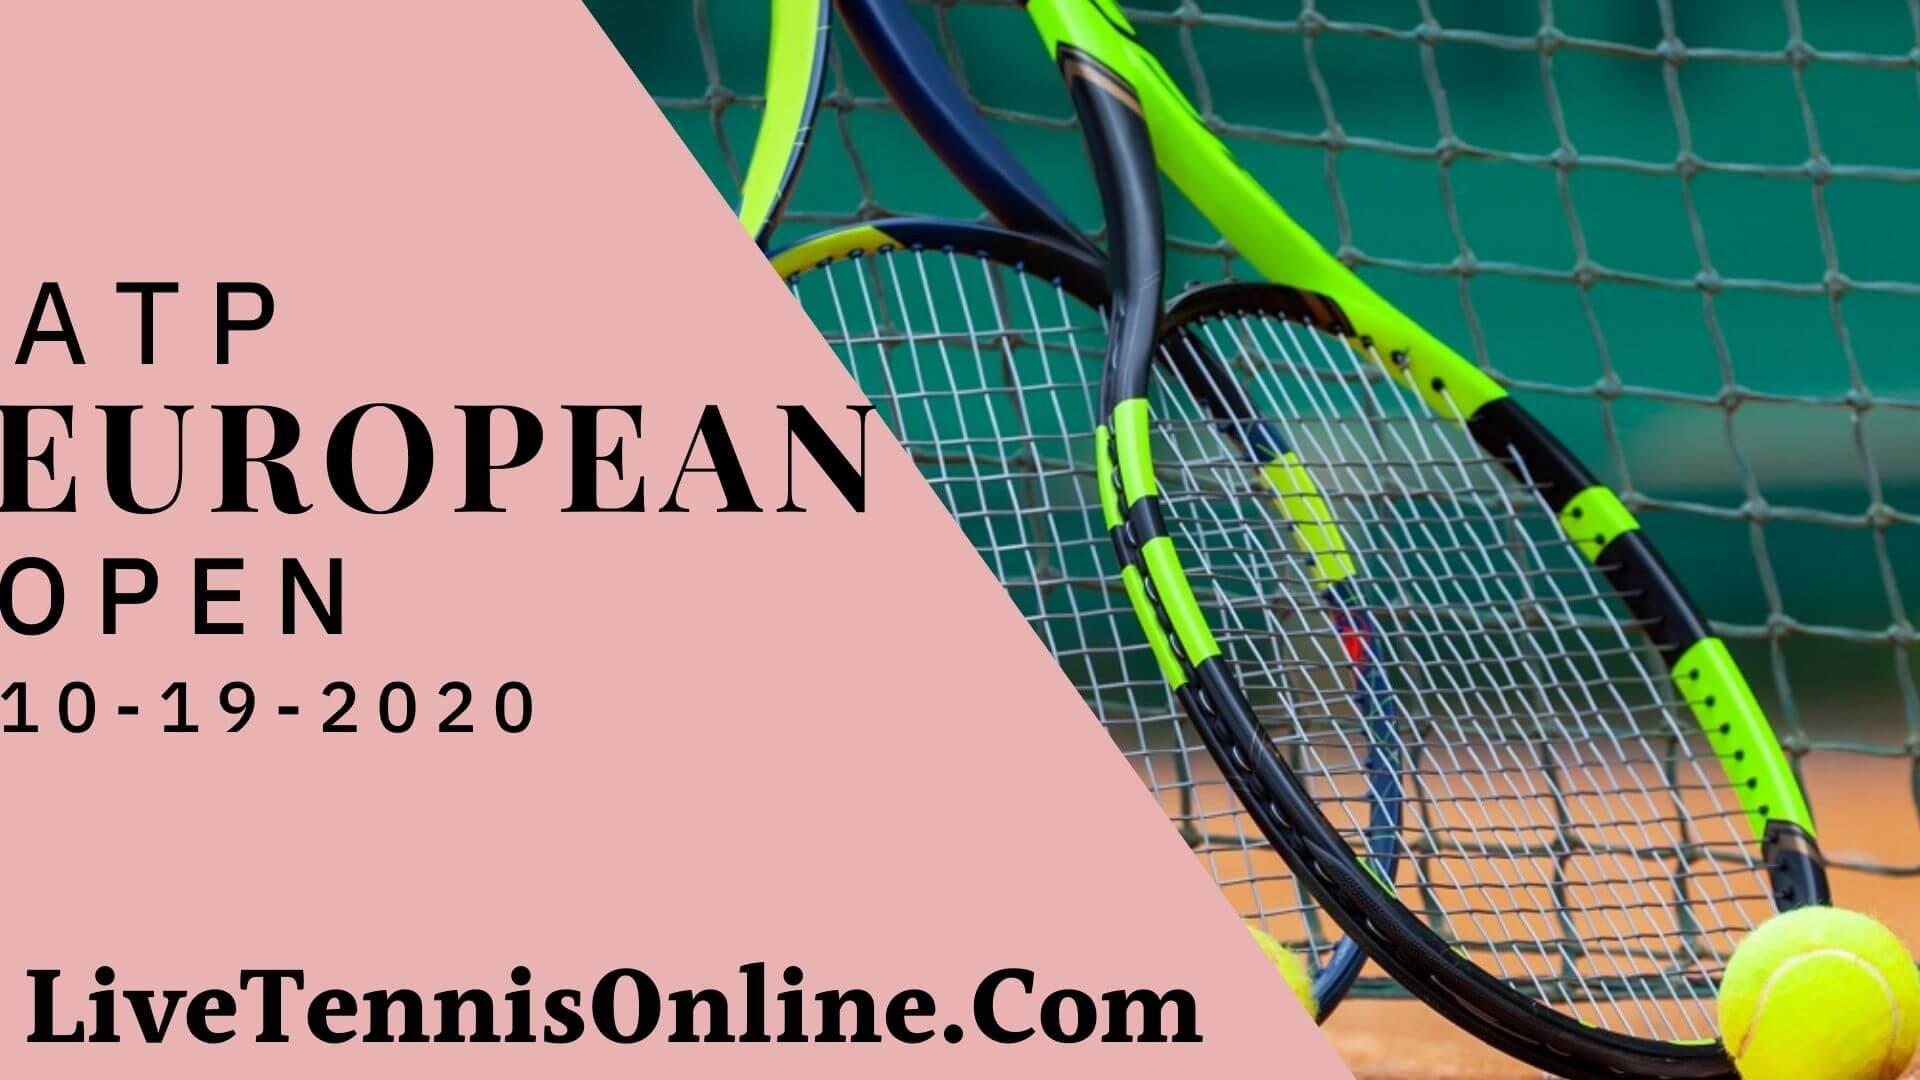 2018 European Open Live Online